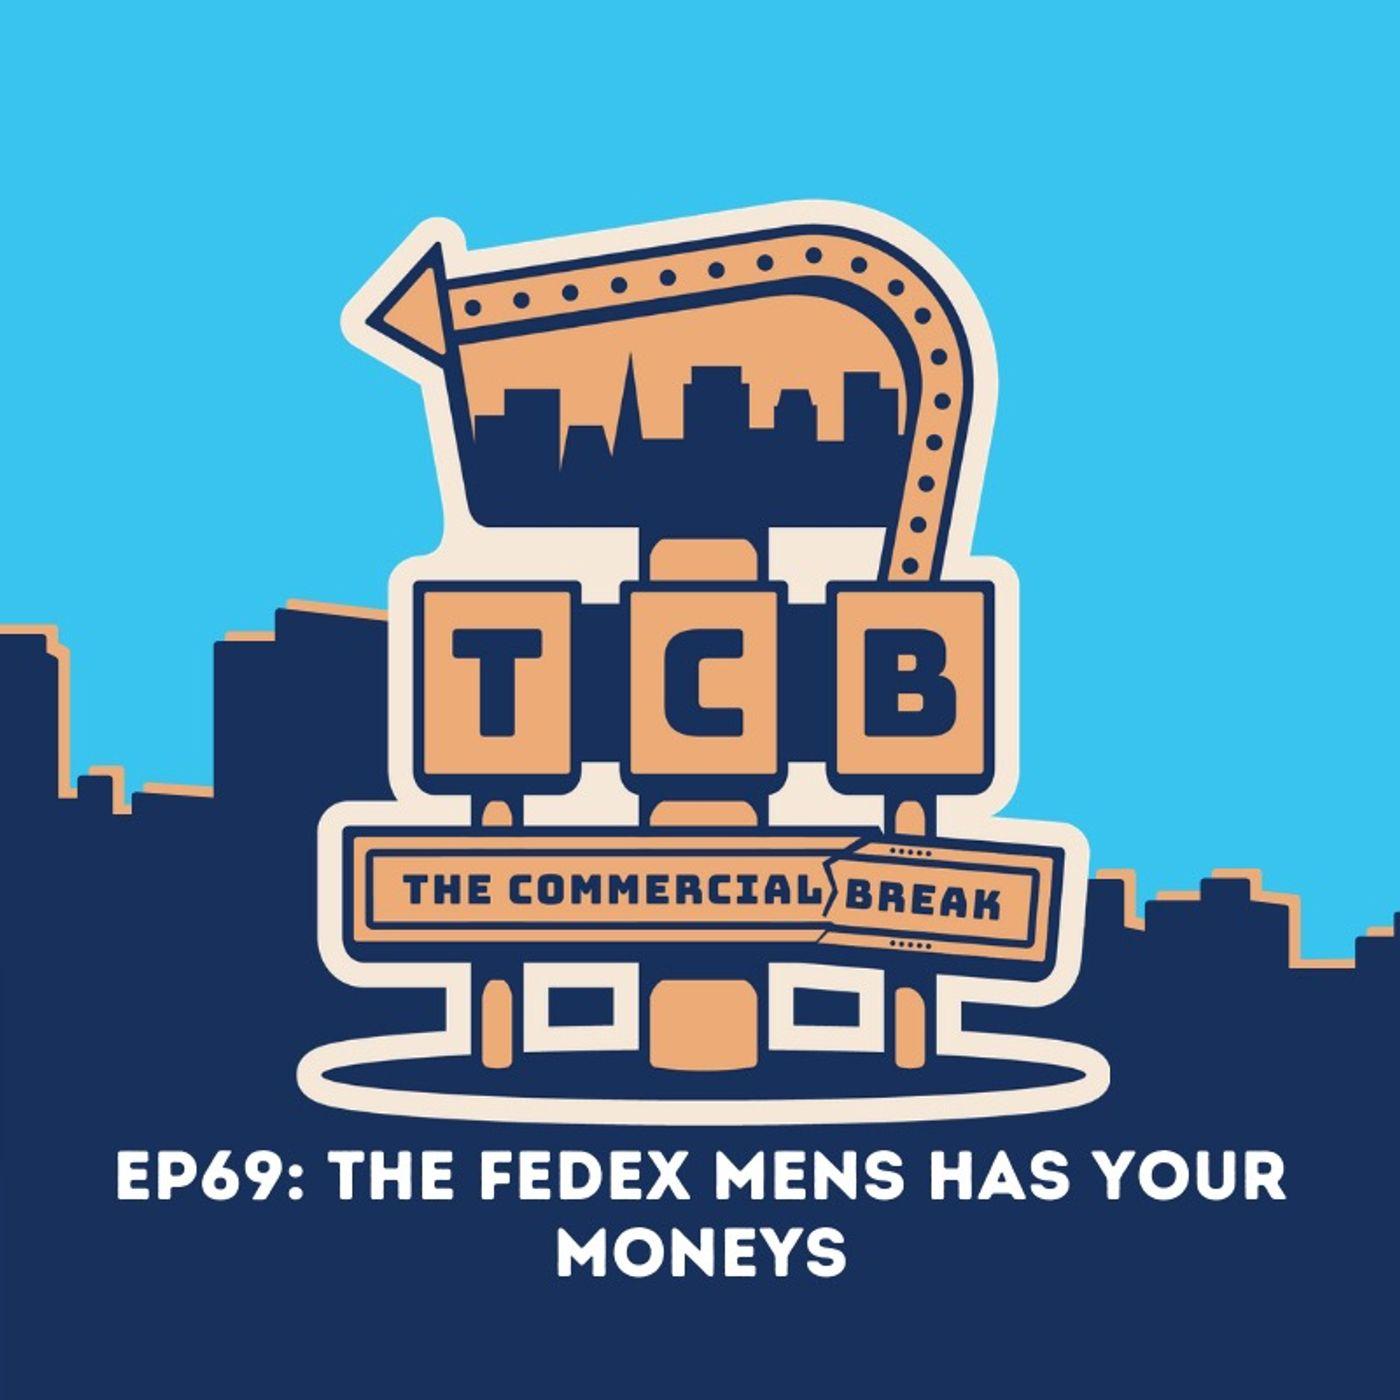 EP69: FedEx Mens Have Your Moneys!